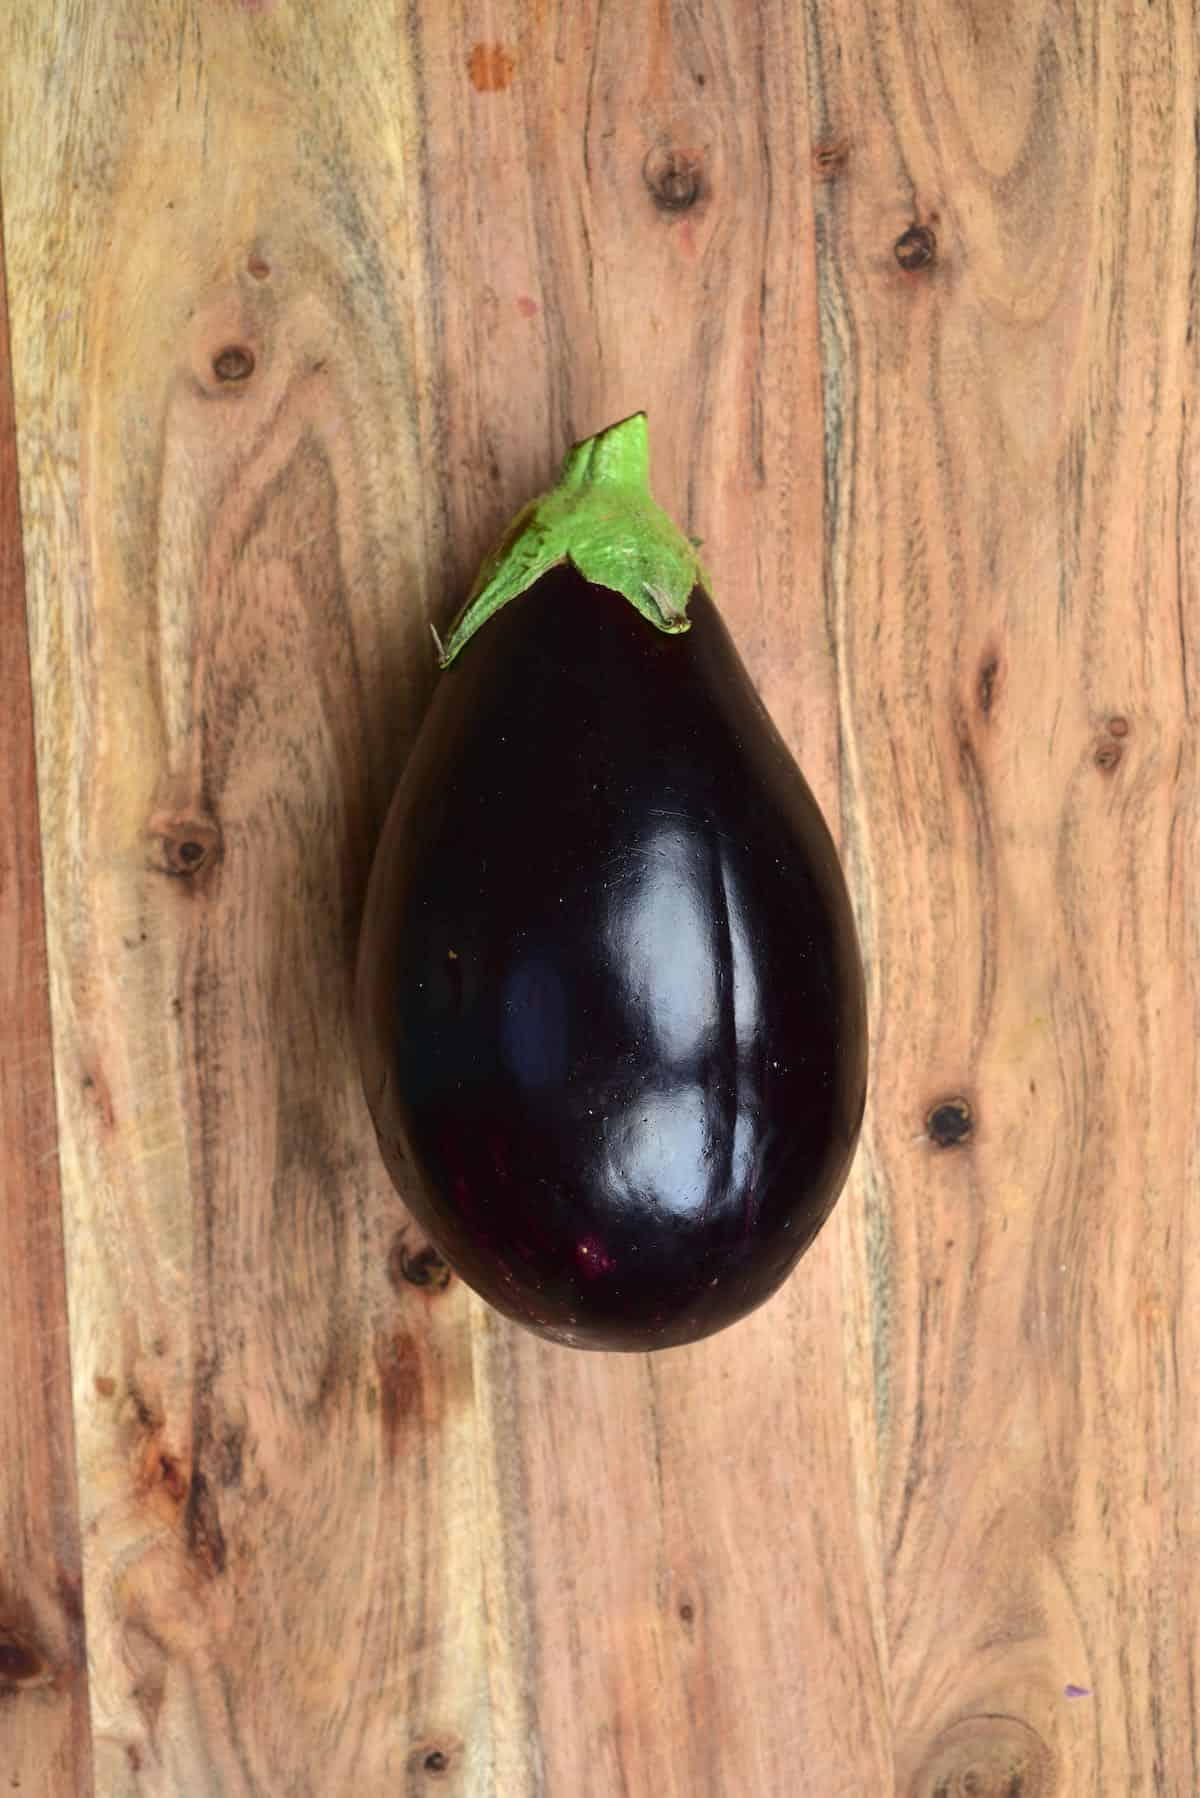 An eggplant on a chopping board